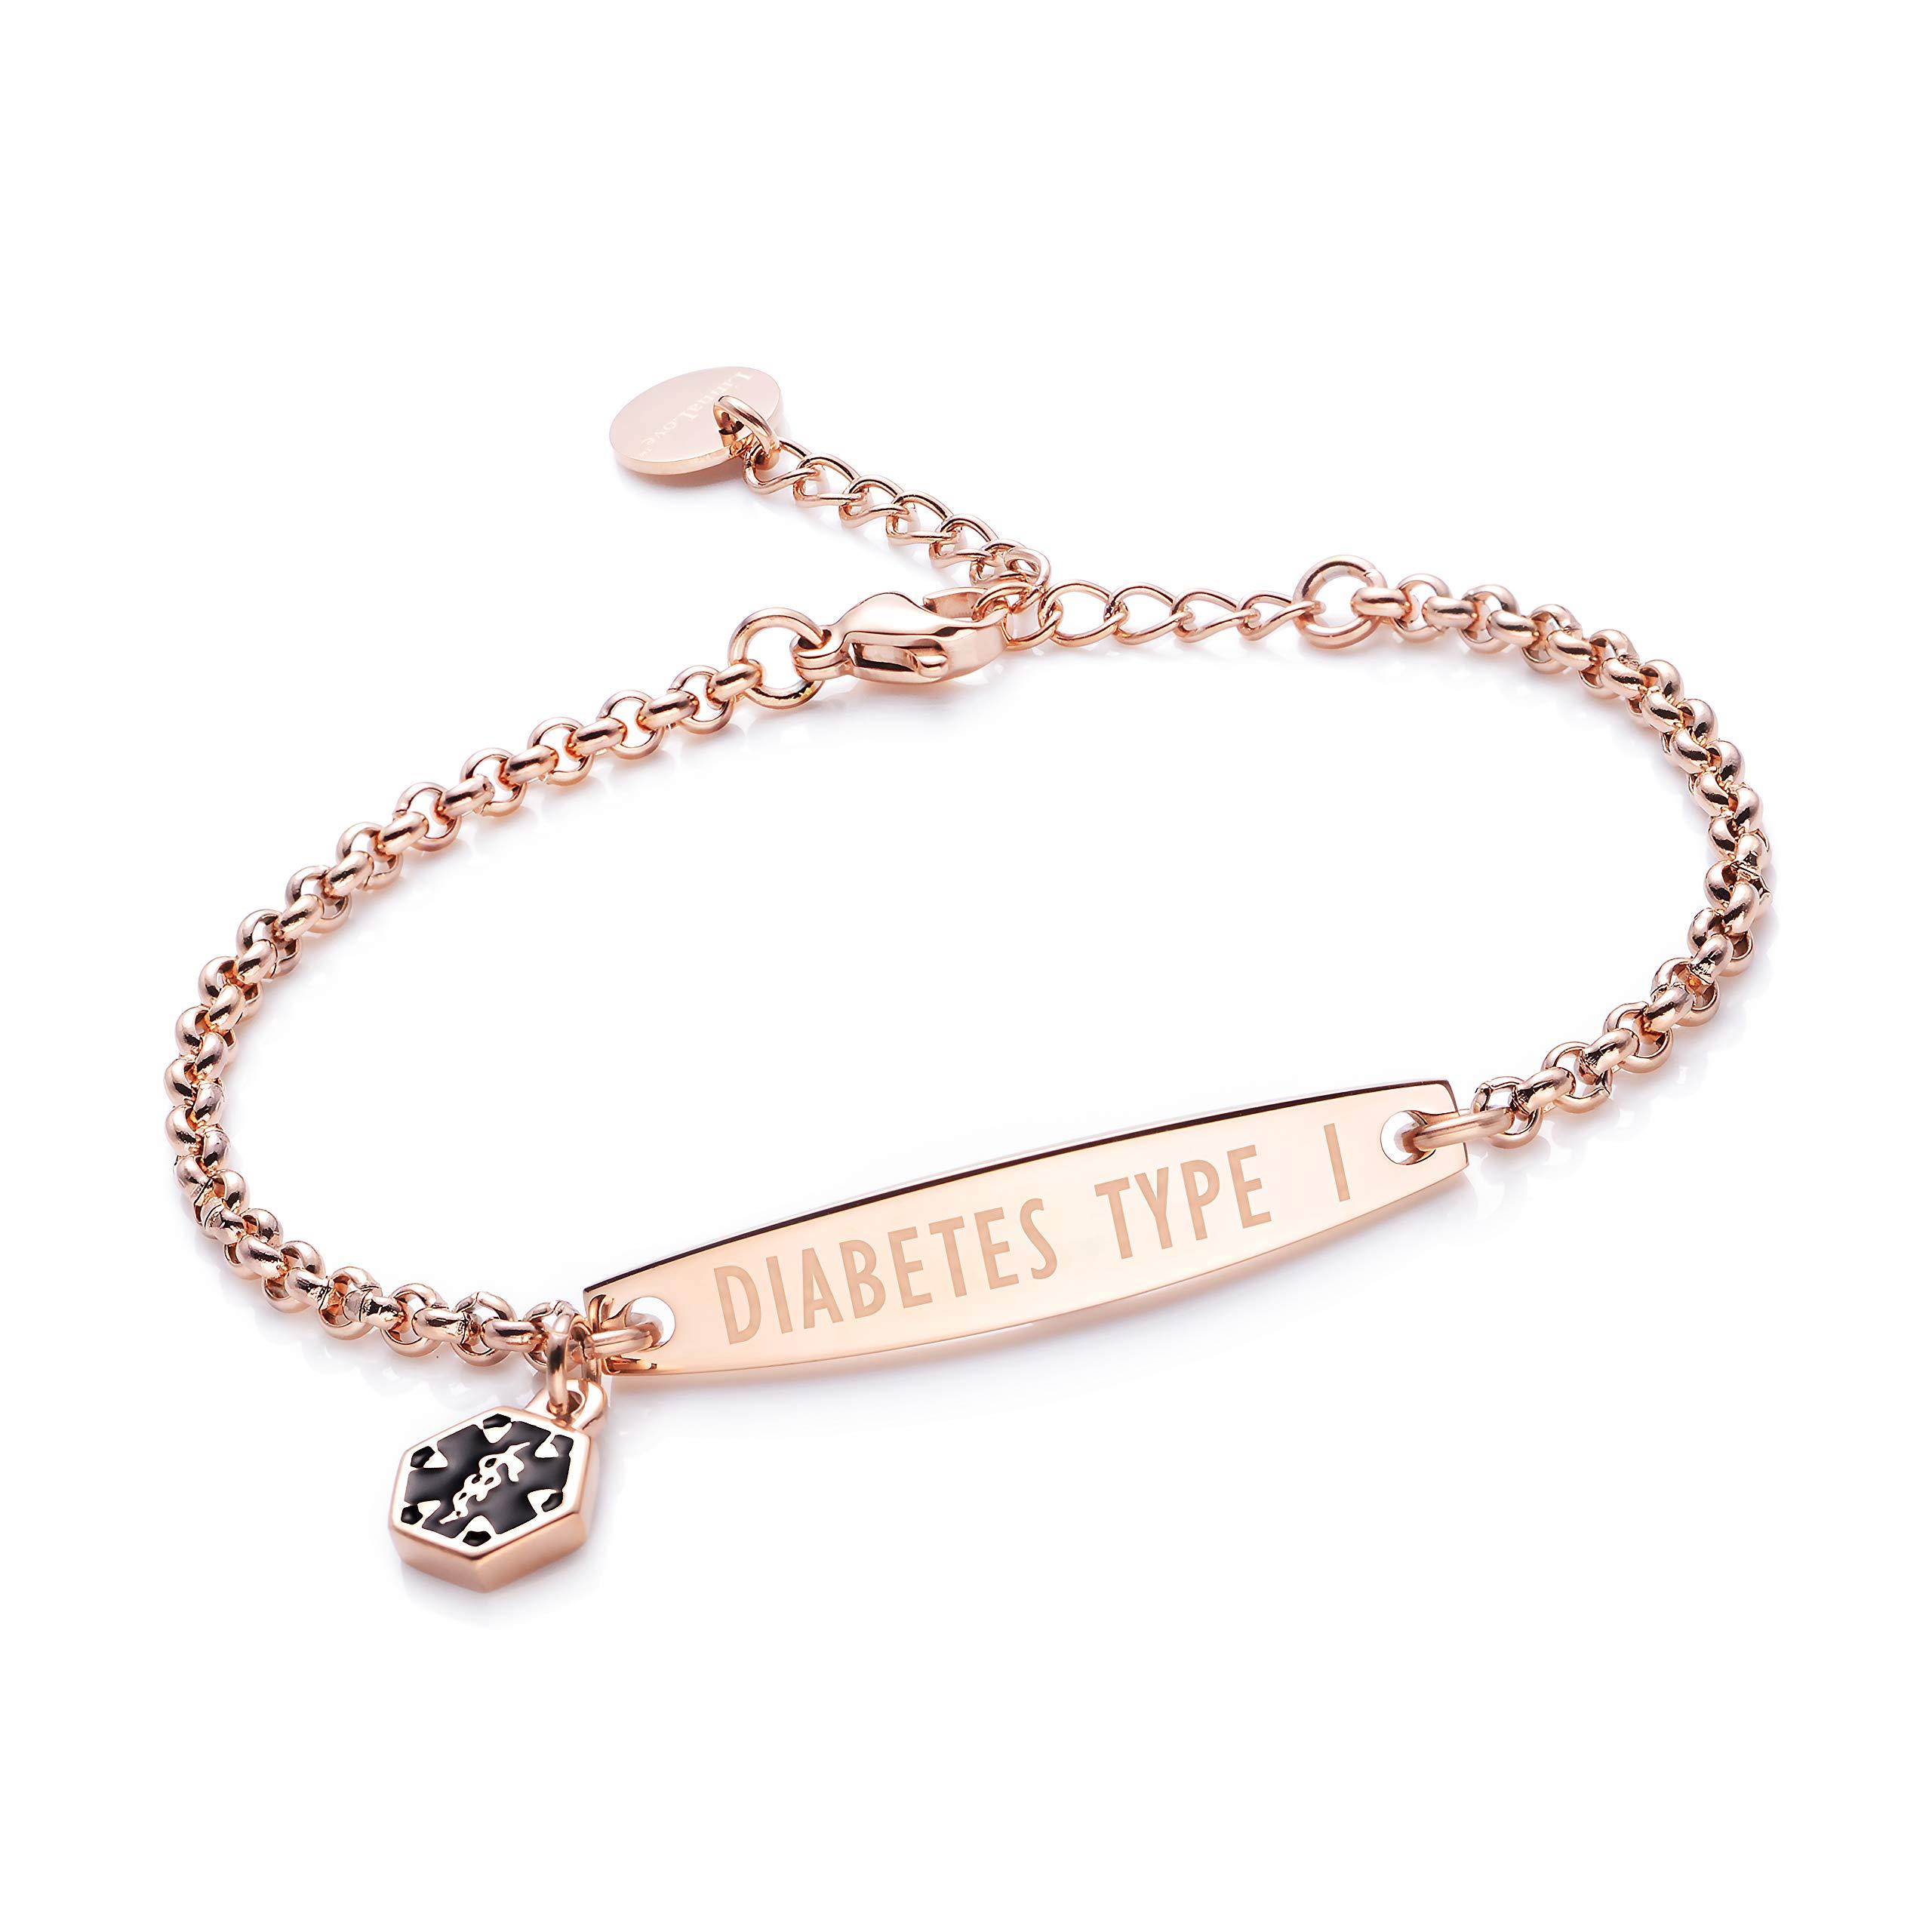 linnalove-Rose Gold Simple Rolo Chain Medical Alert id Bracelet for Women & Girl-Diabetes Type 1